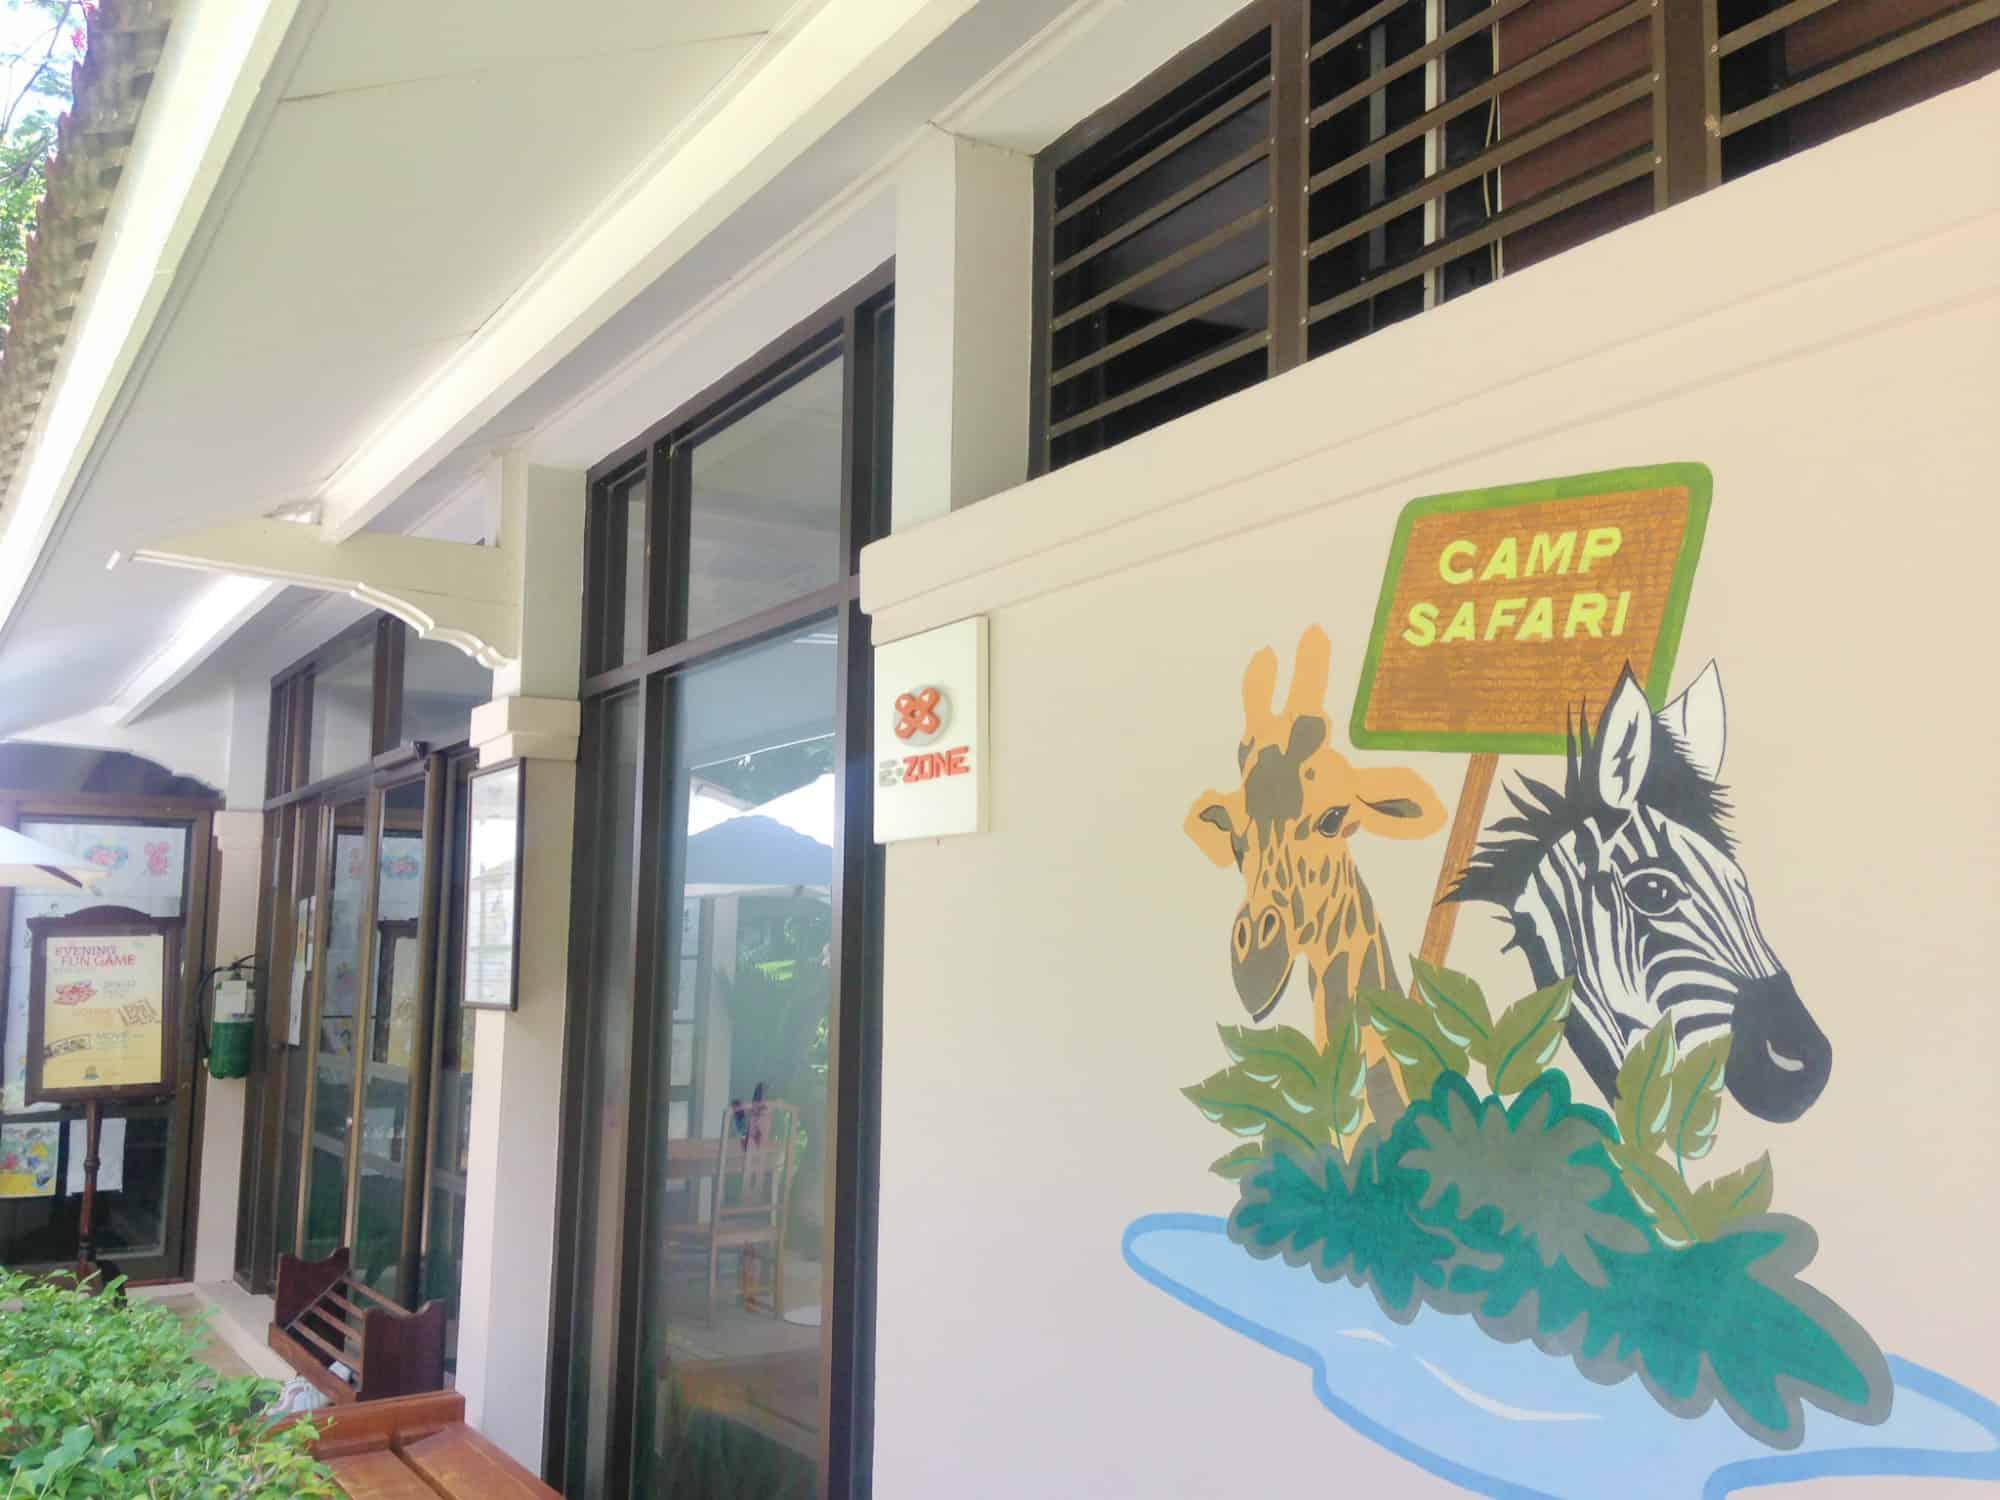 Grand Centara Hua Hin, Thailand: Reviewed | My Travel Monkey